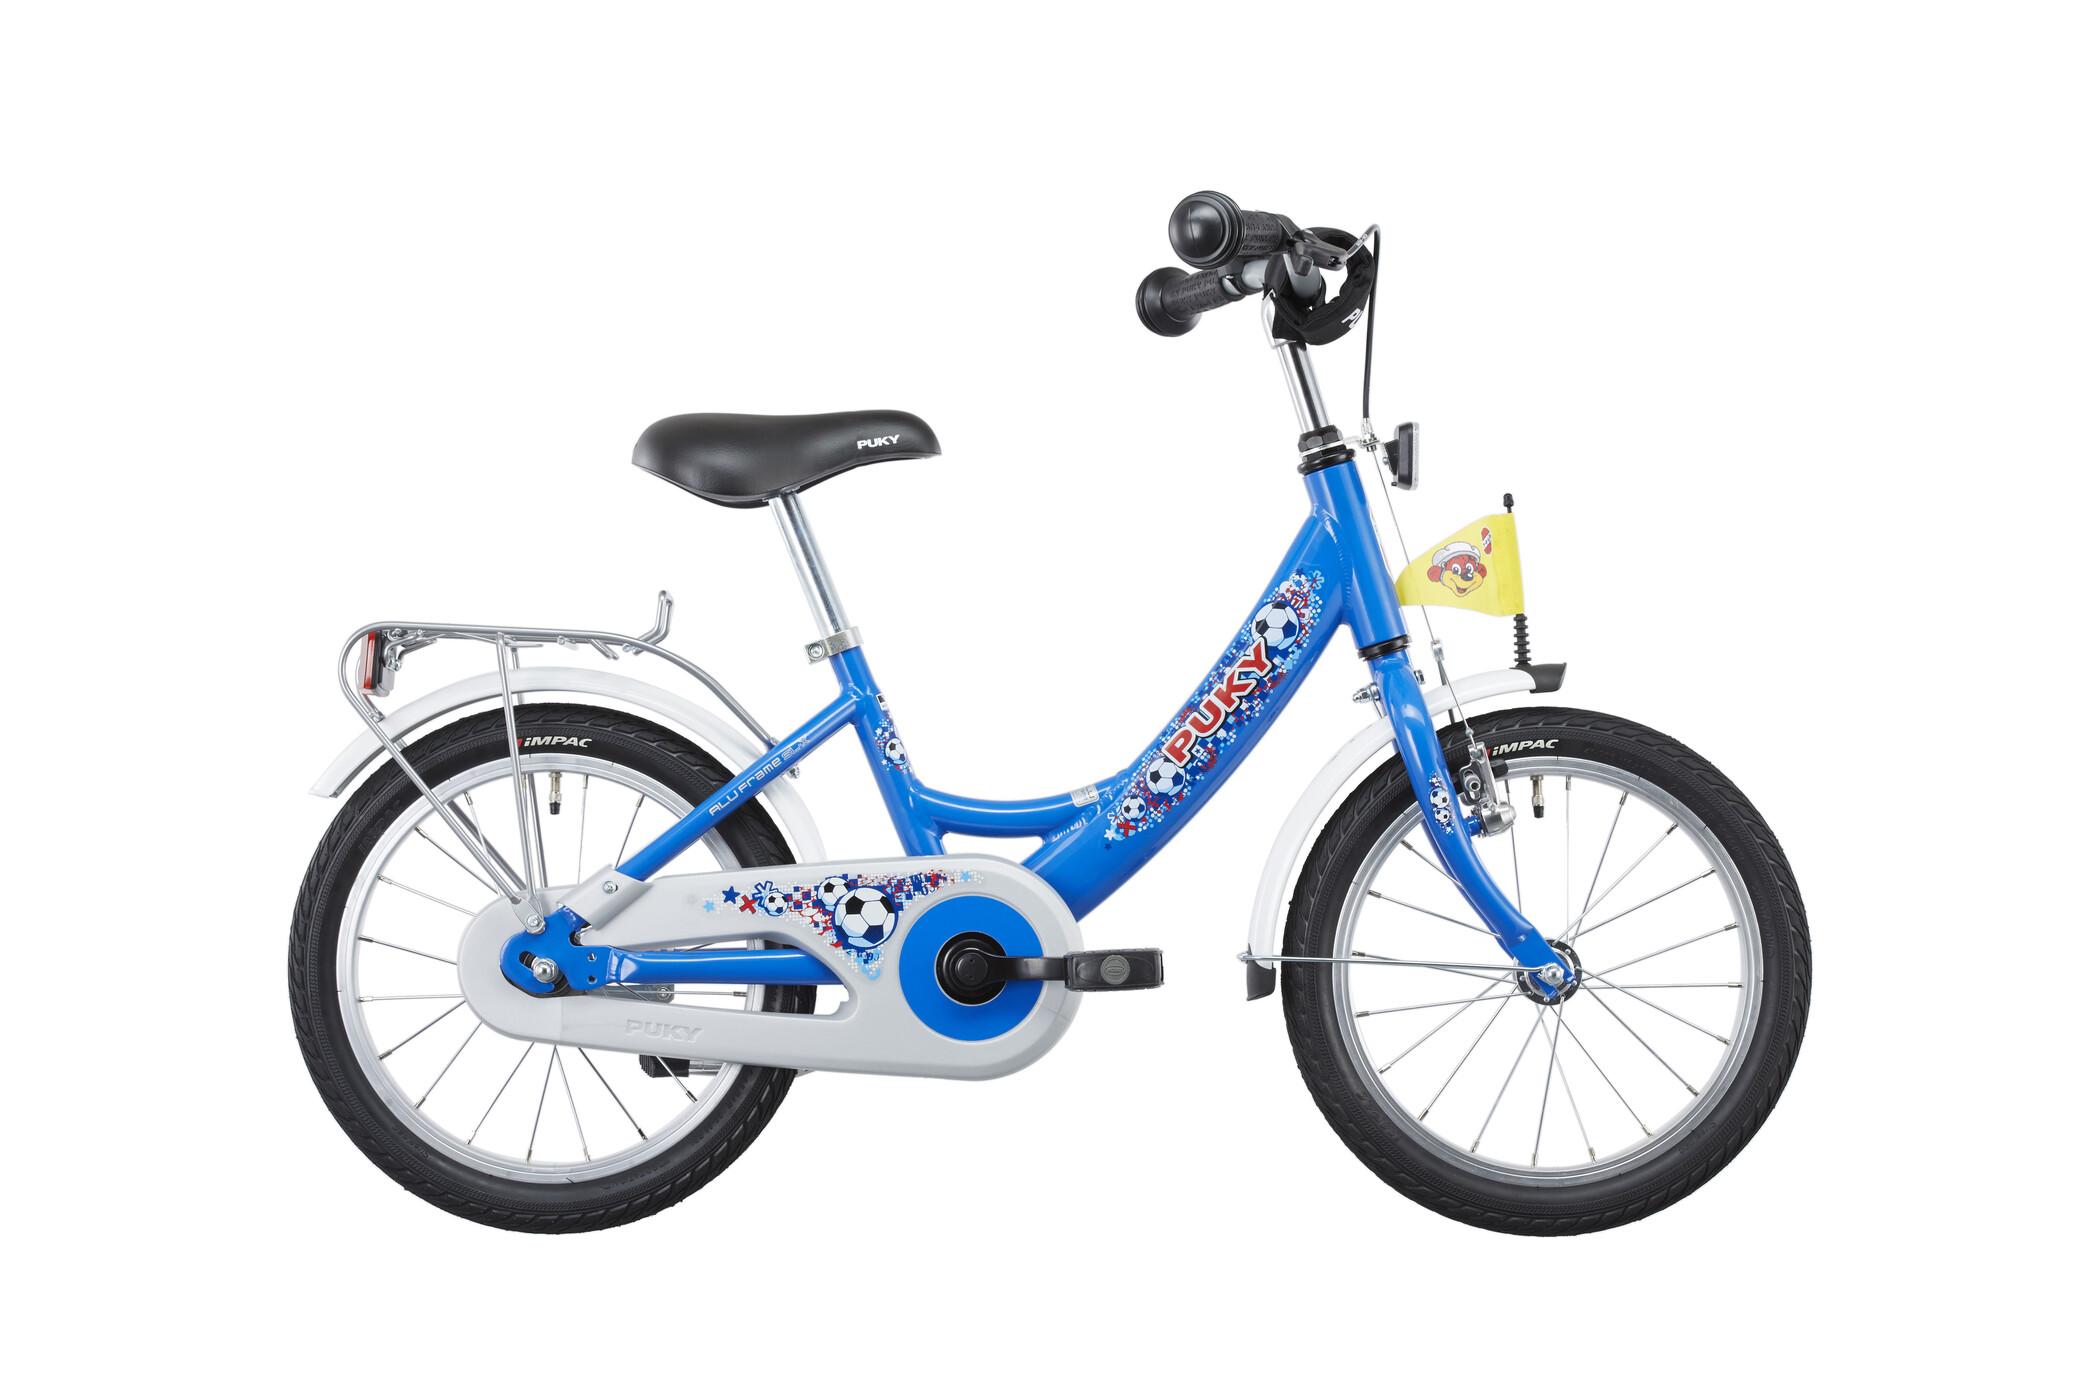 Puky ZL 16 1 Alu Fahrrad 16 Kinder online kaufen   bikester.at